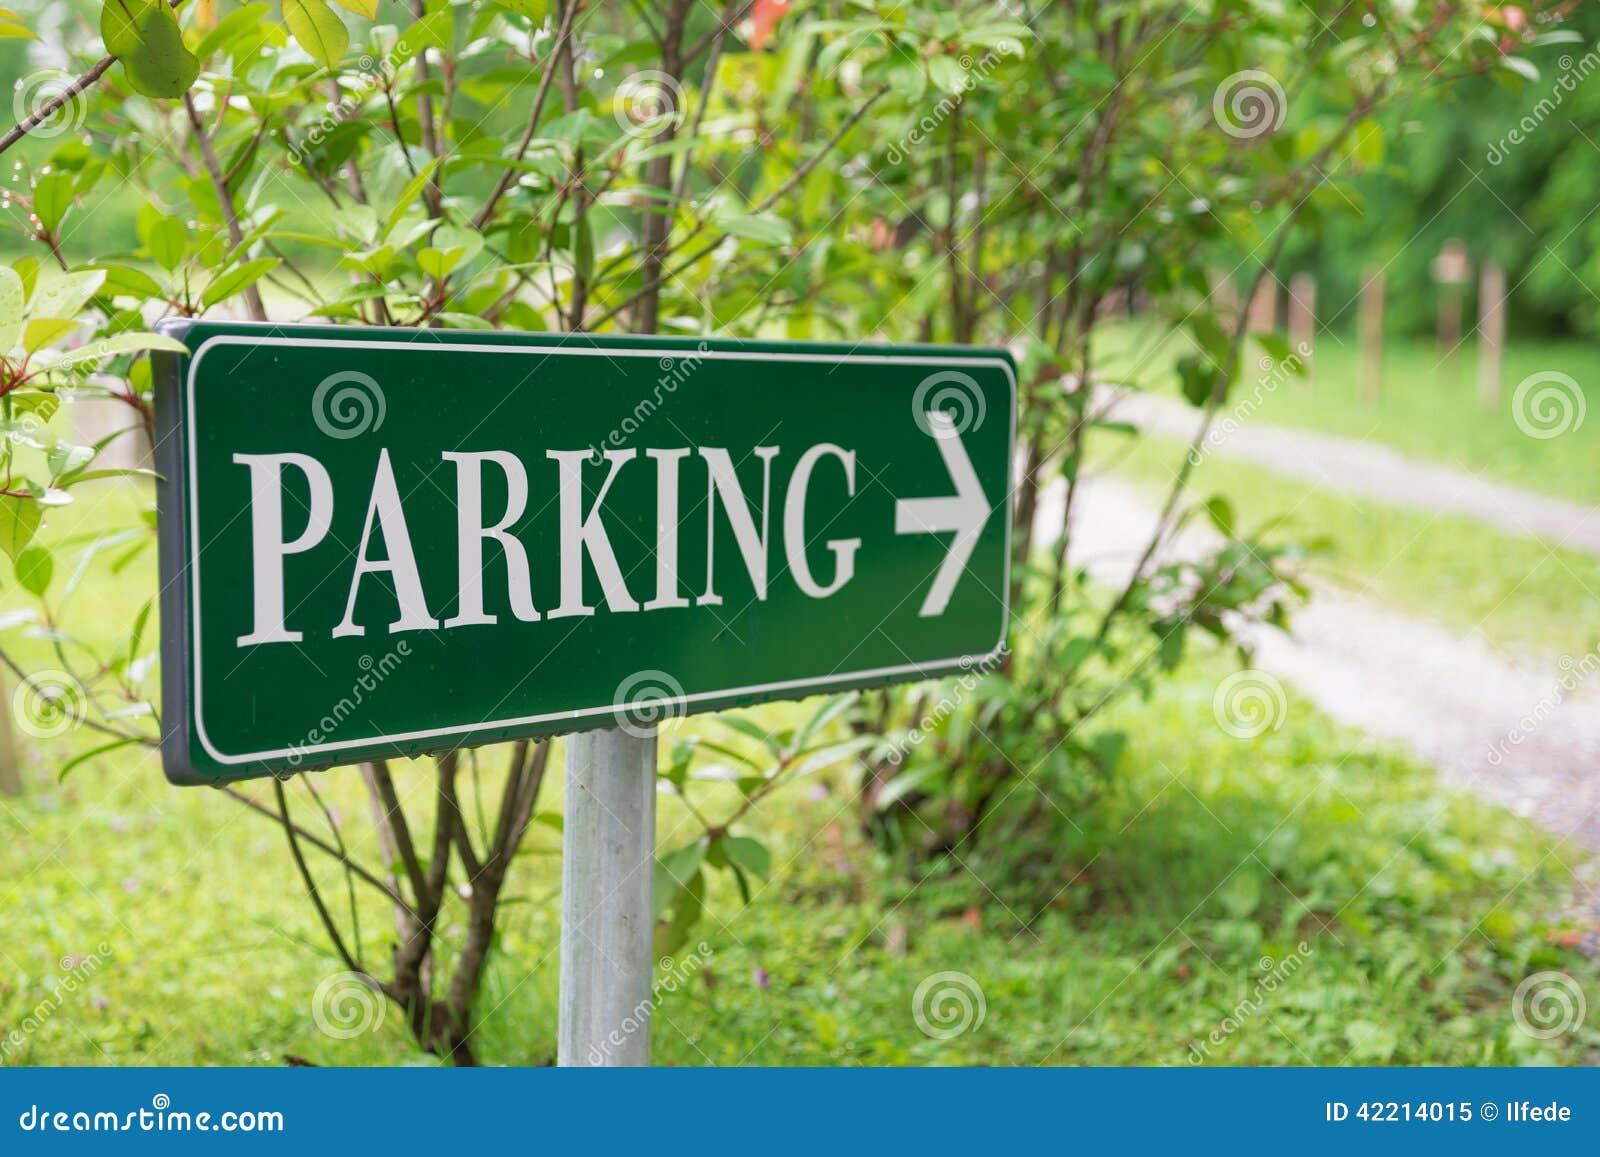 parking sign in the park stock photo image 42214015. Black Bedroom Furniture Sets. Home Design Ideas